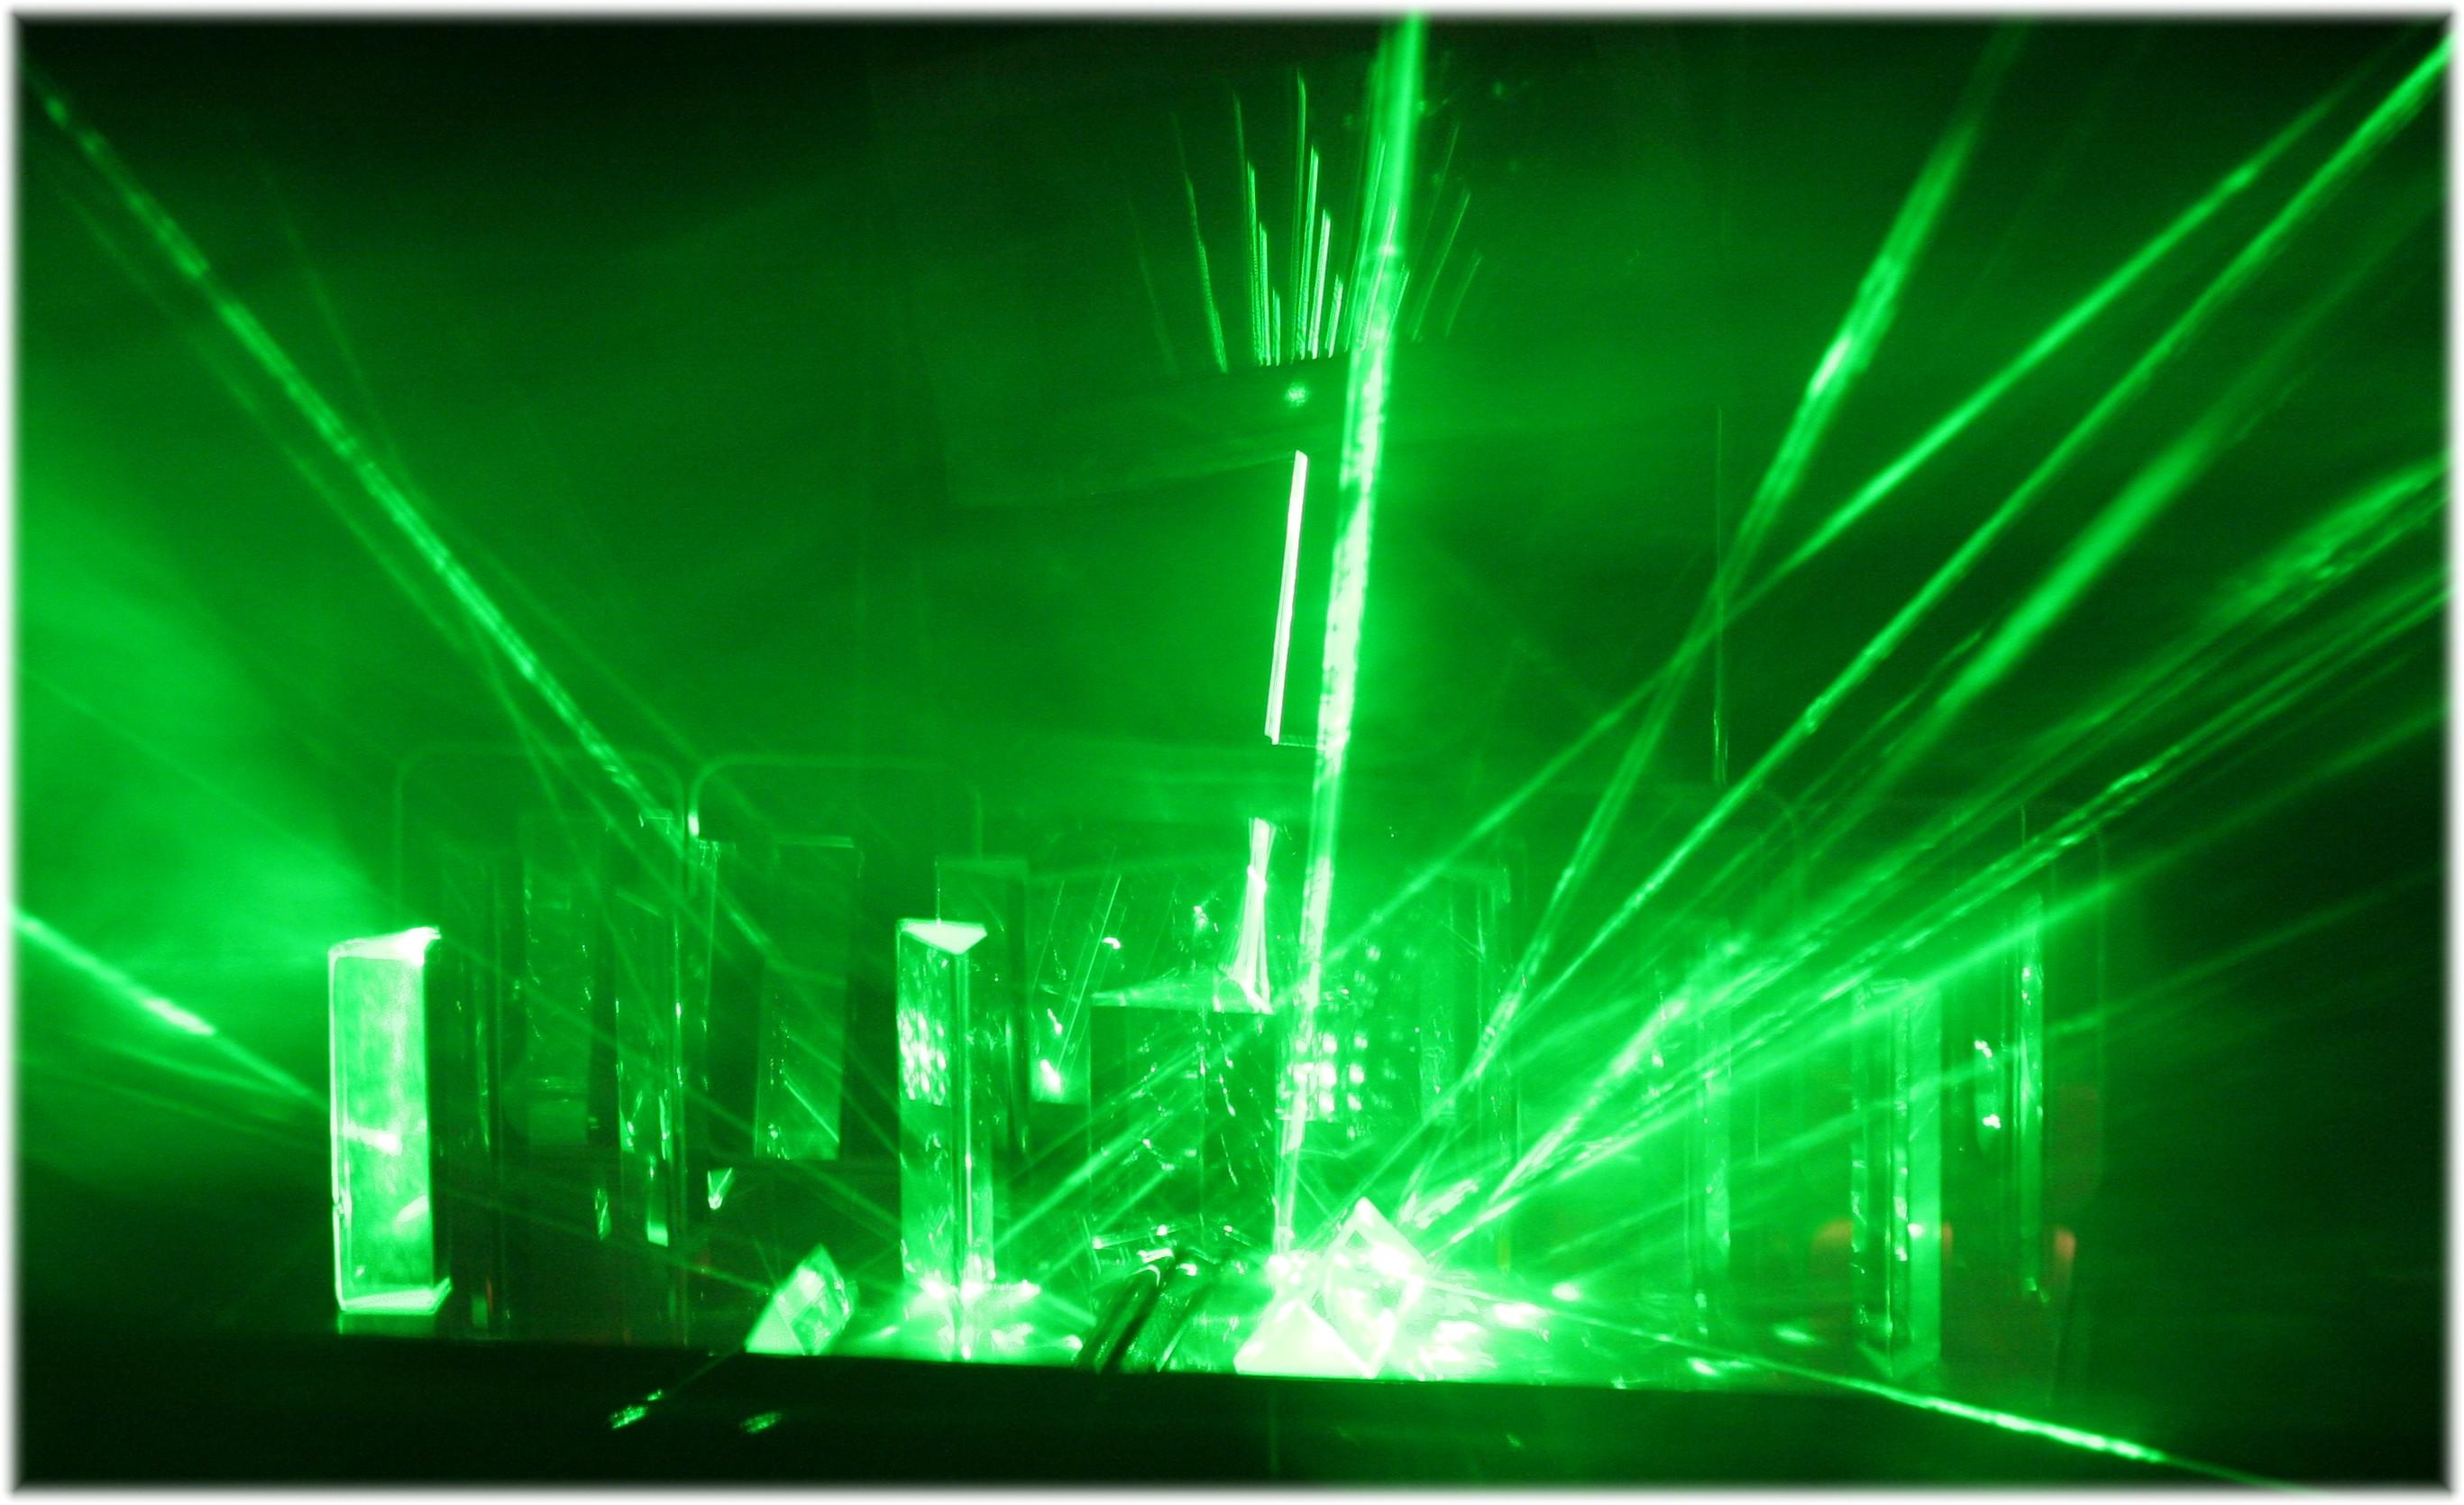 laser light show - photo #27